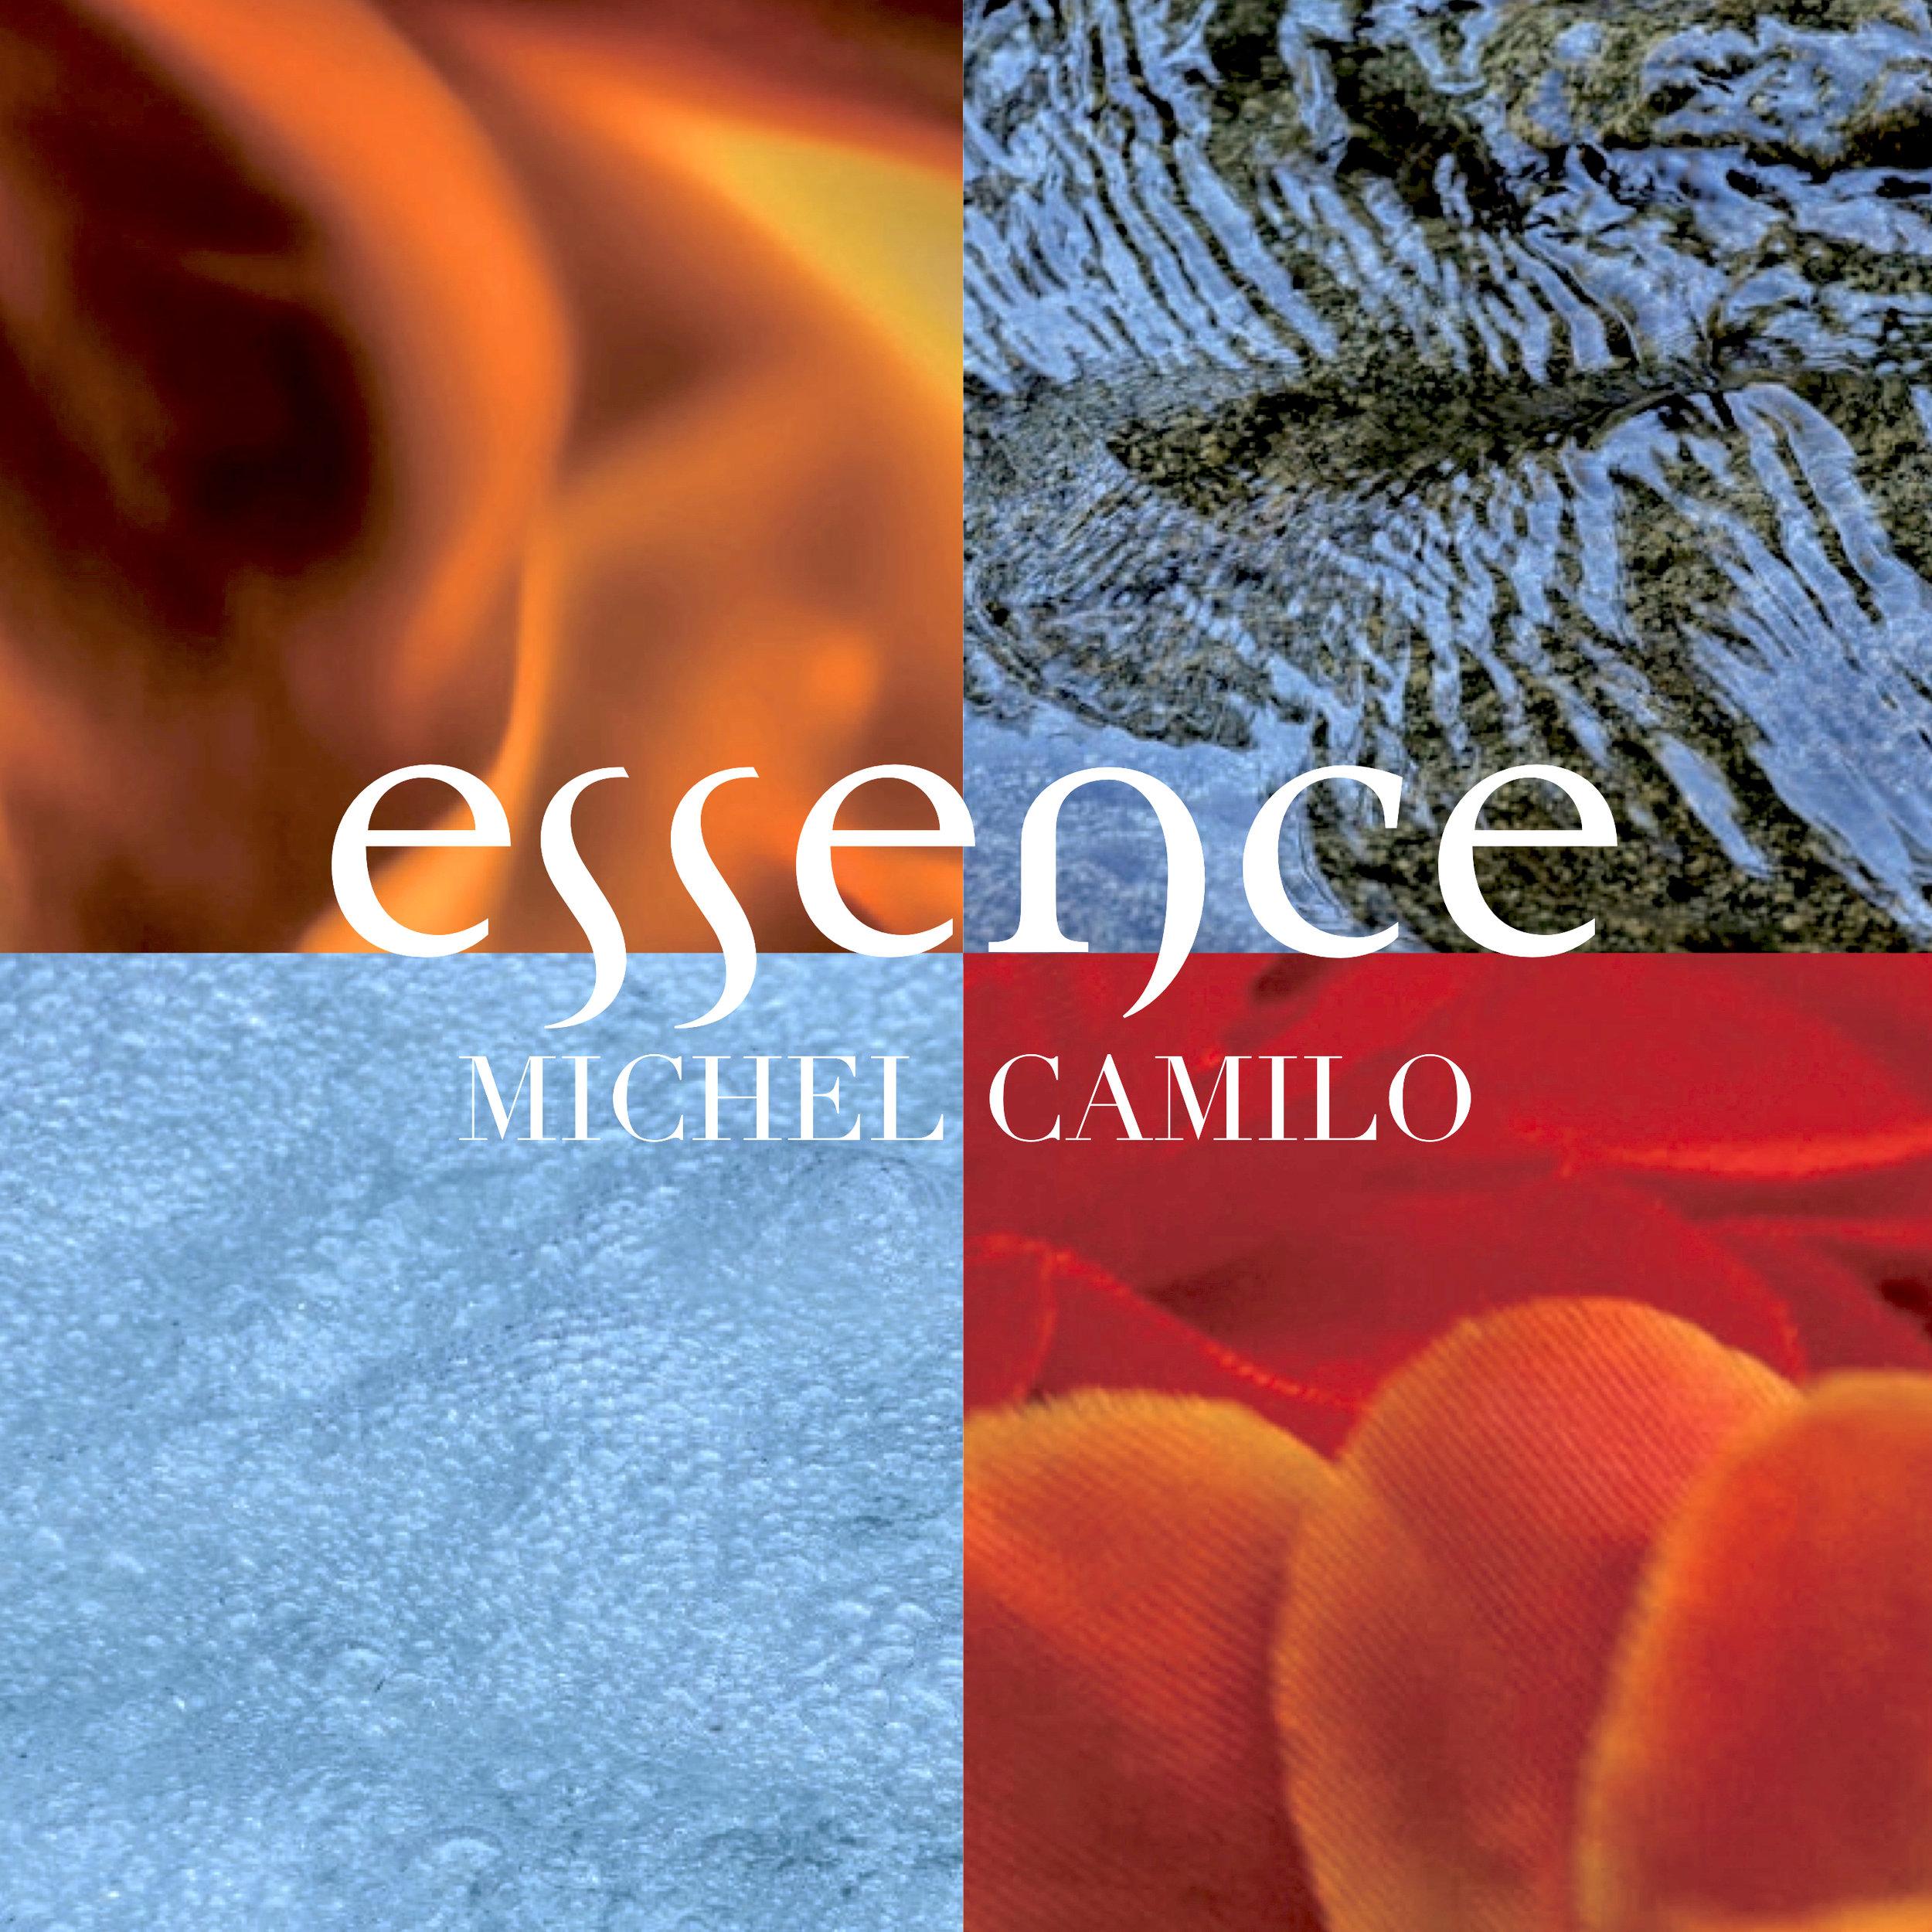 2019: Essence